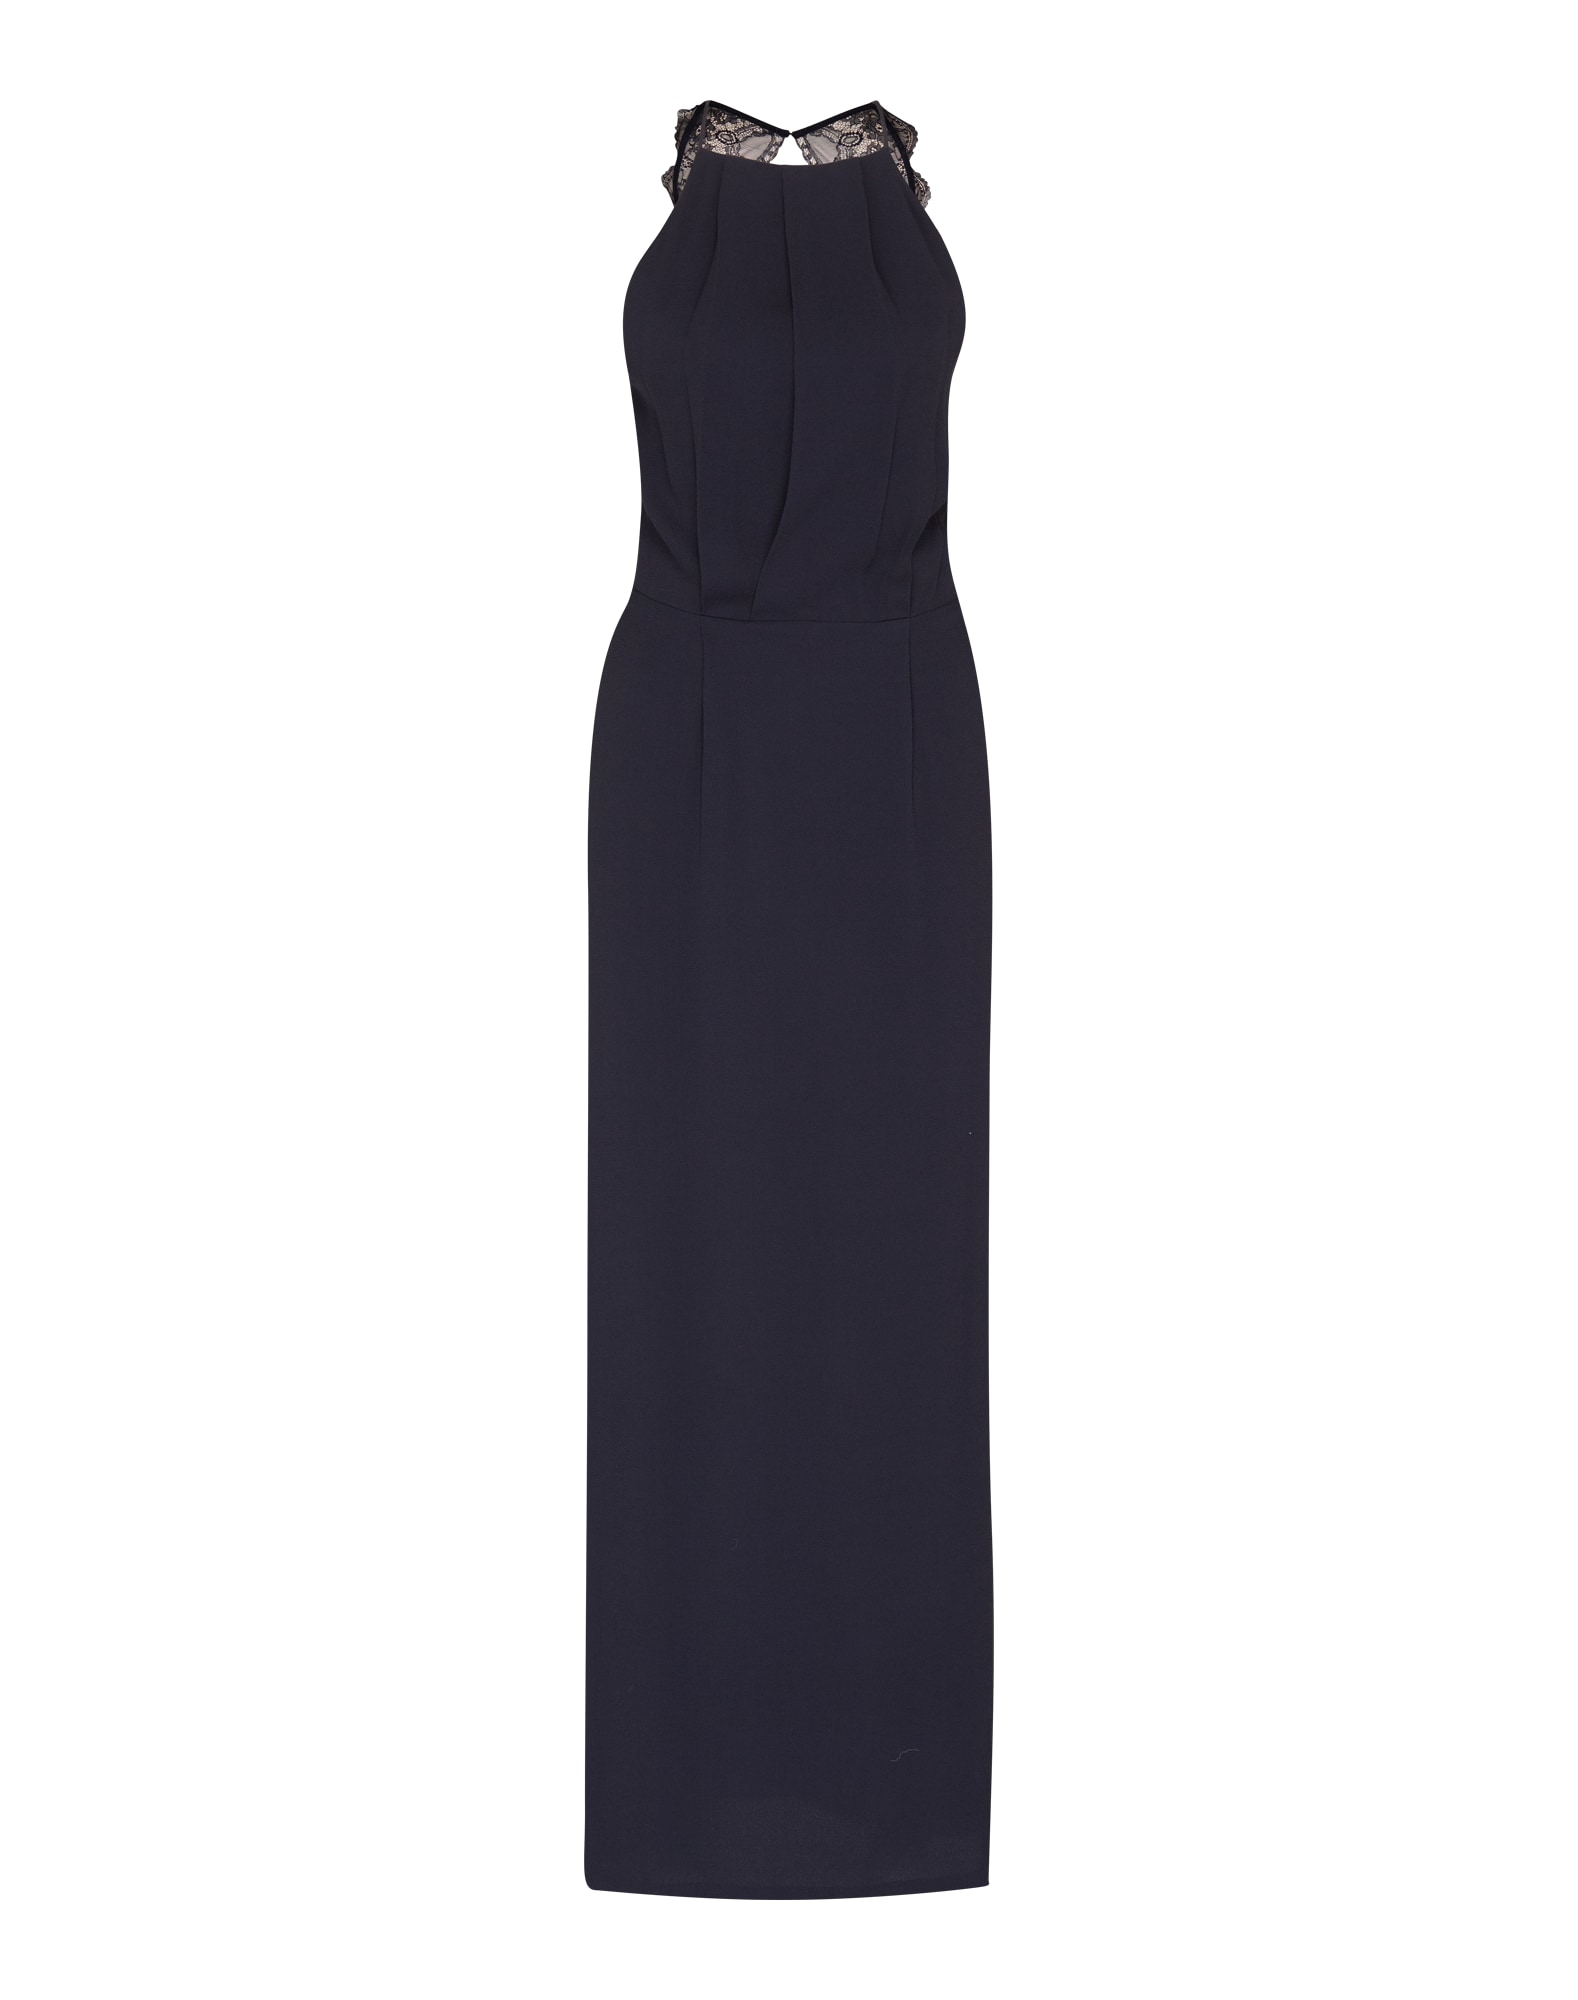 Společenské šaty Willow 5687 tmavě modrá Samsoe & Samsoe